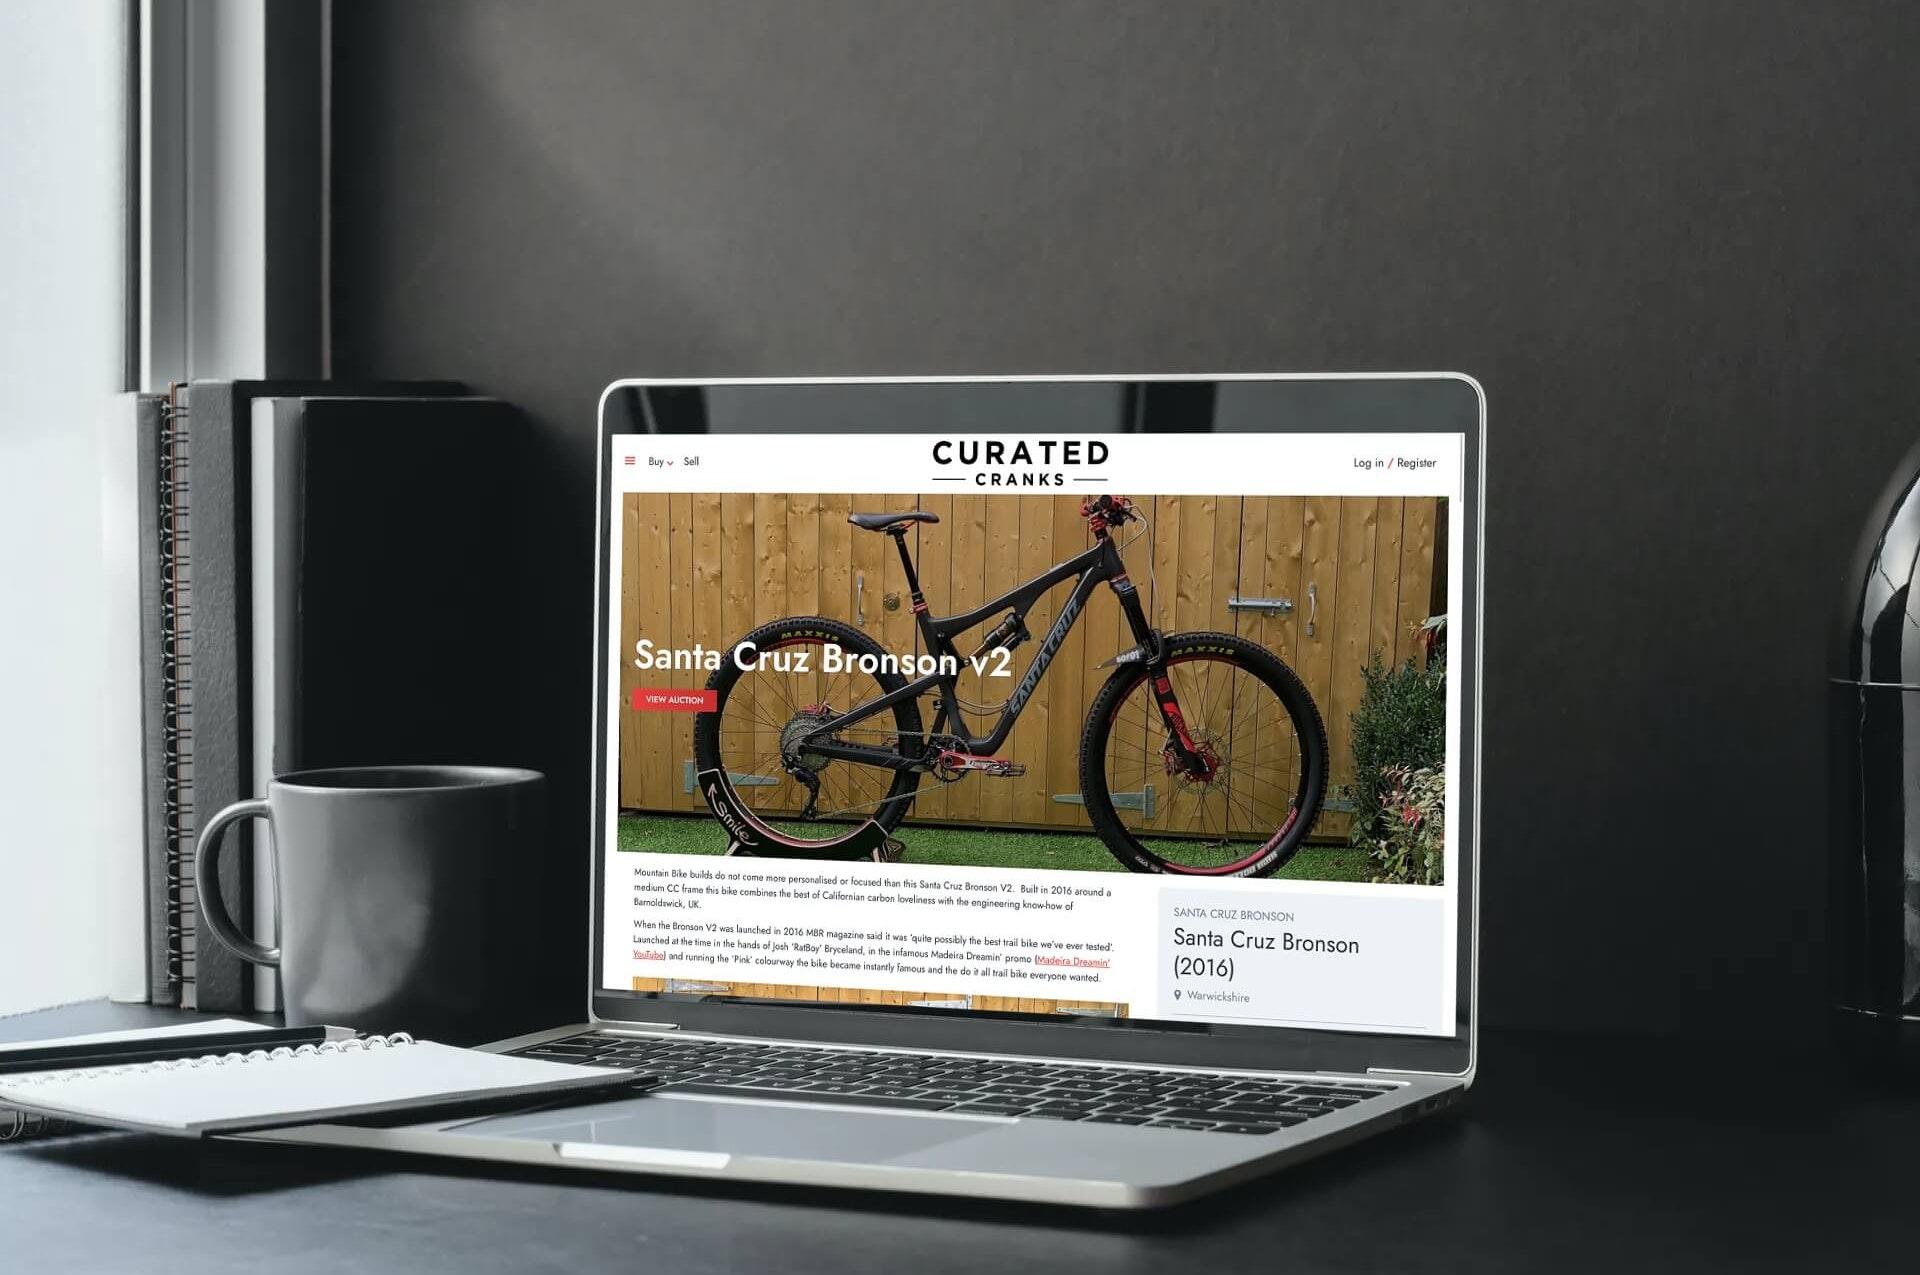 curated cranks website displayed laptop